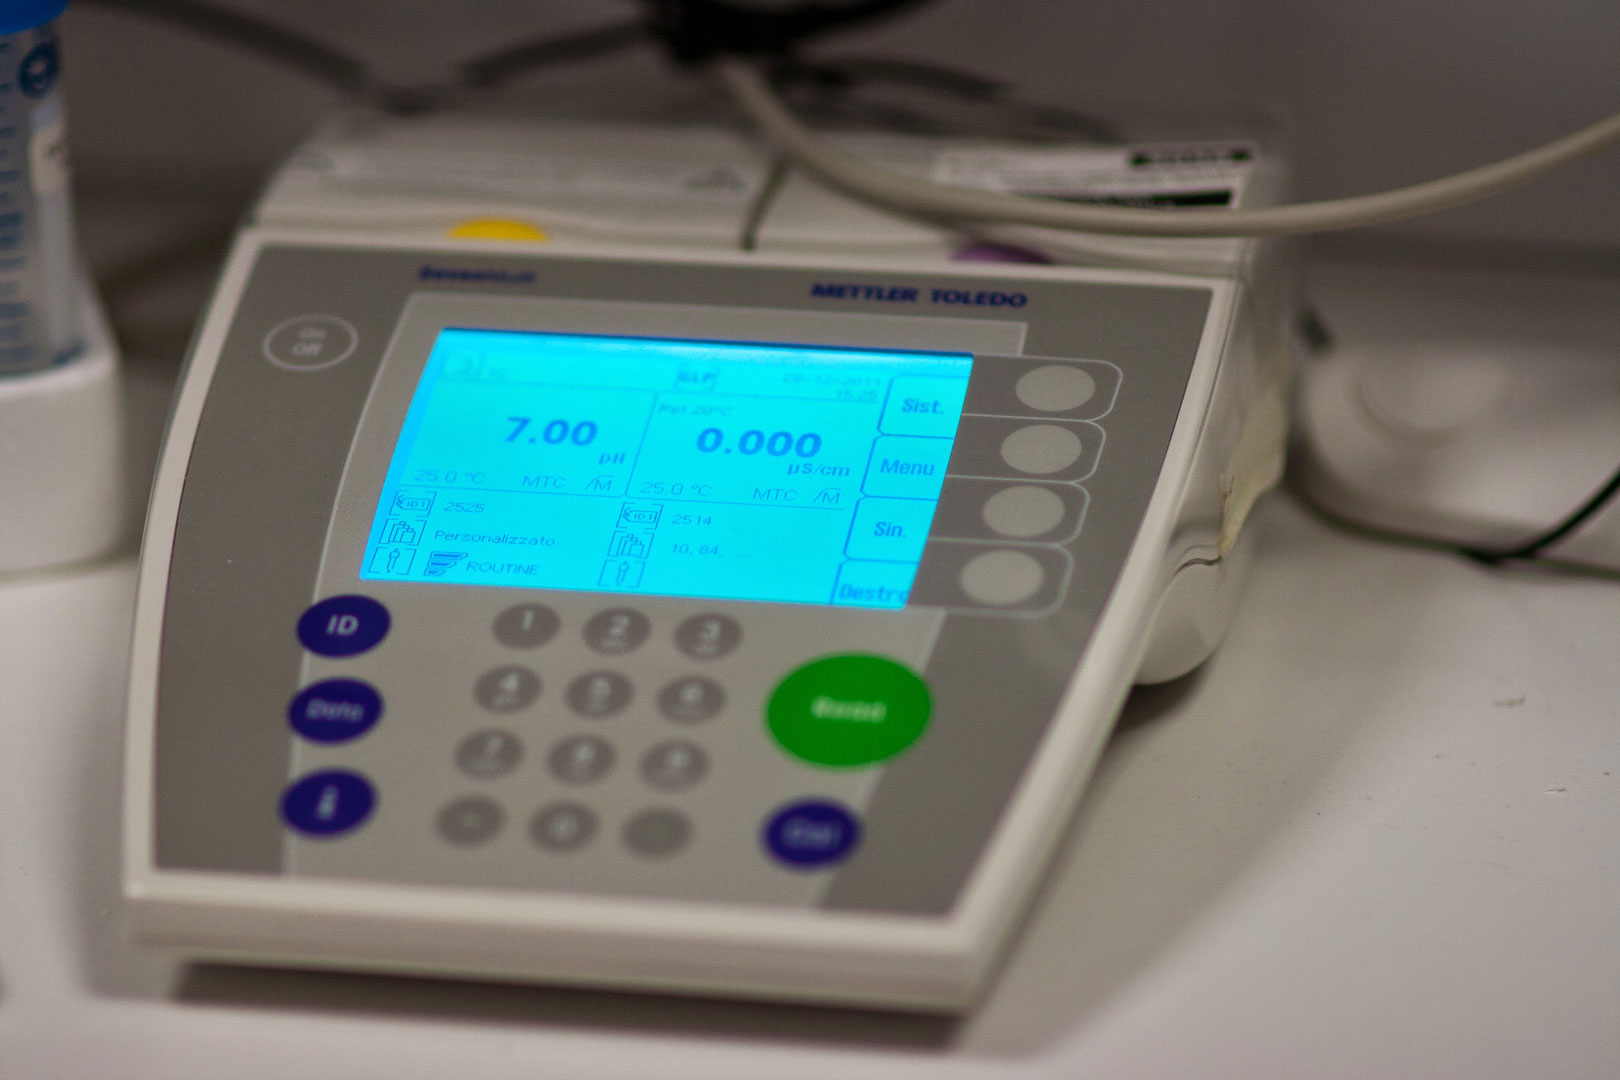 laboratorio-biosan-toledo-2